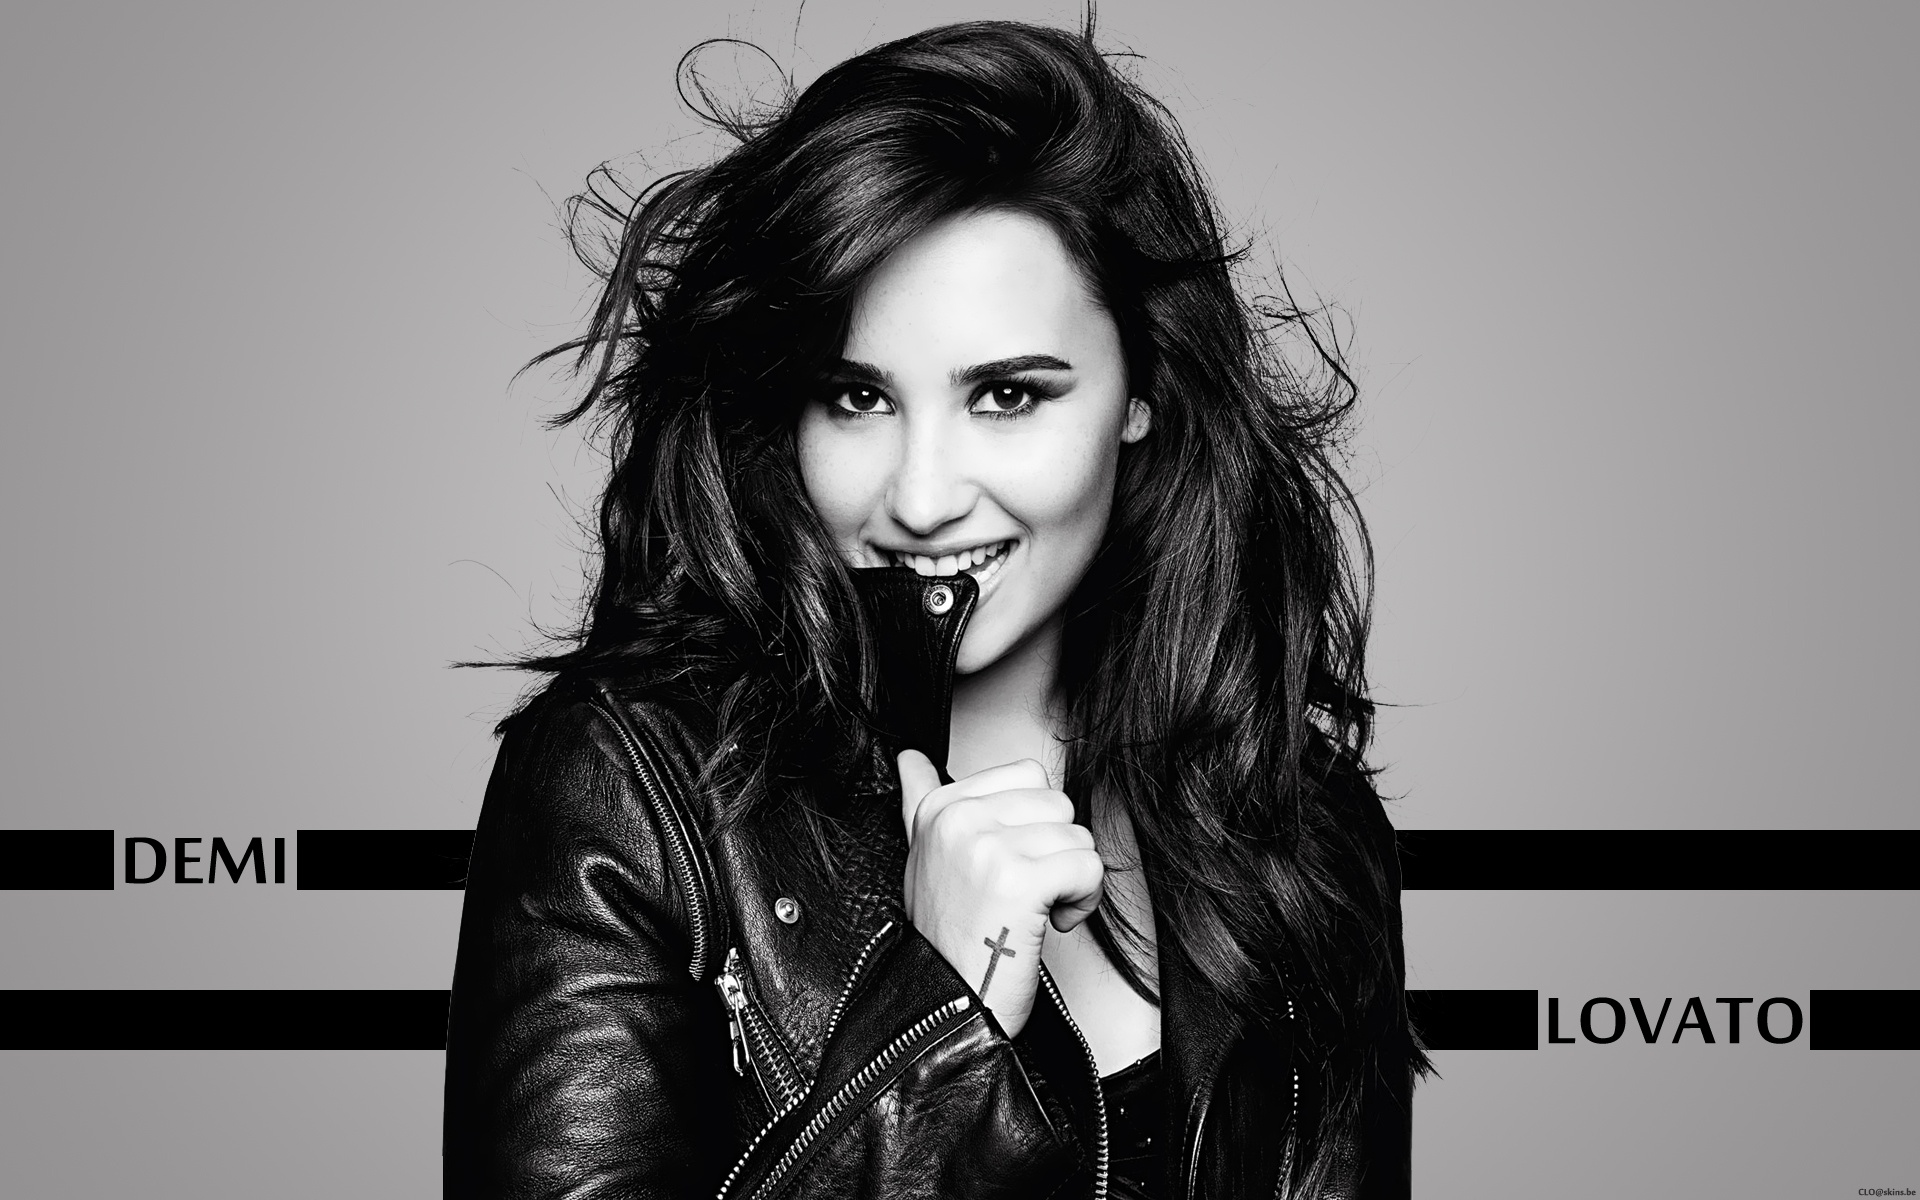 Demi Lovato Girlfriend 2013